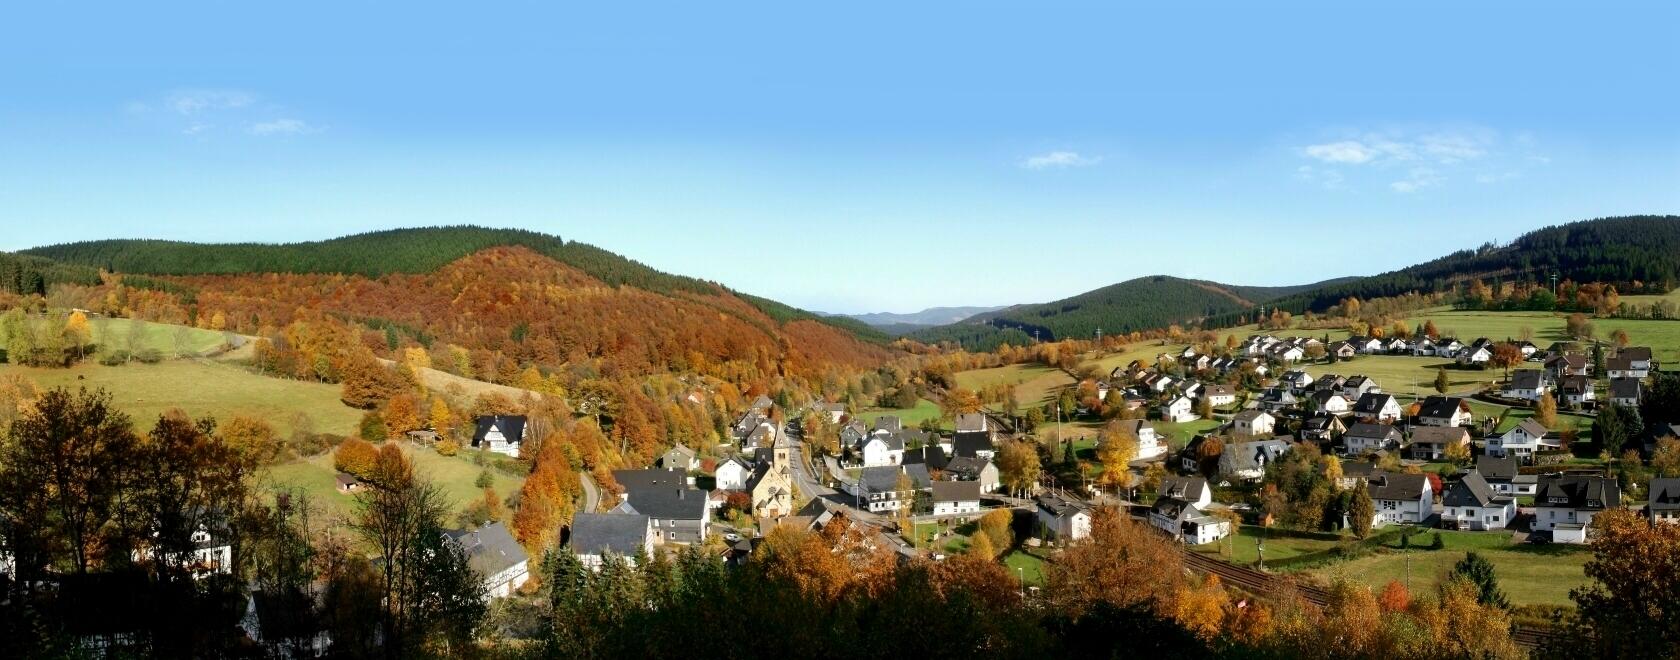 Panorama-Aufnahme Benolpe (Herbst 2012)